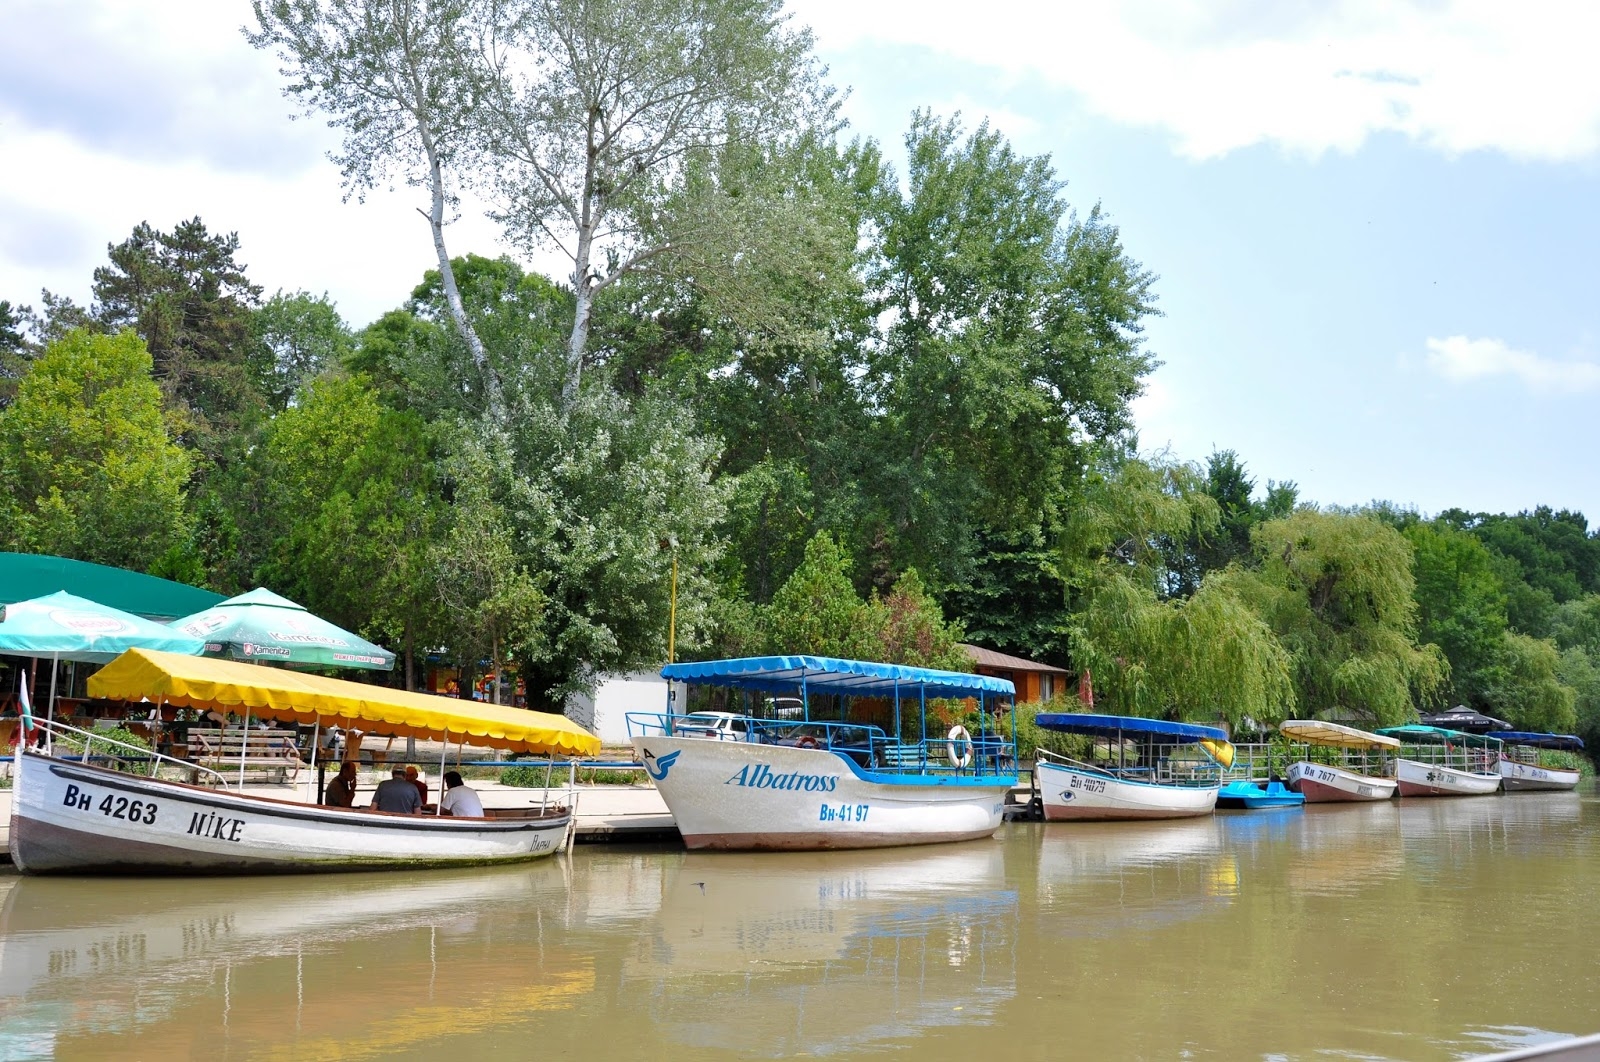 Boats on the Kamchia river, Bulgaria